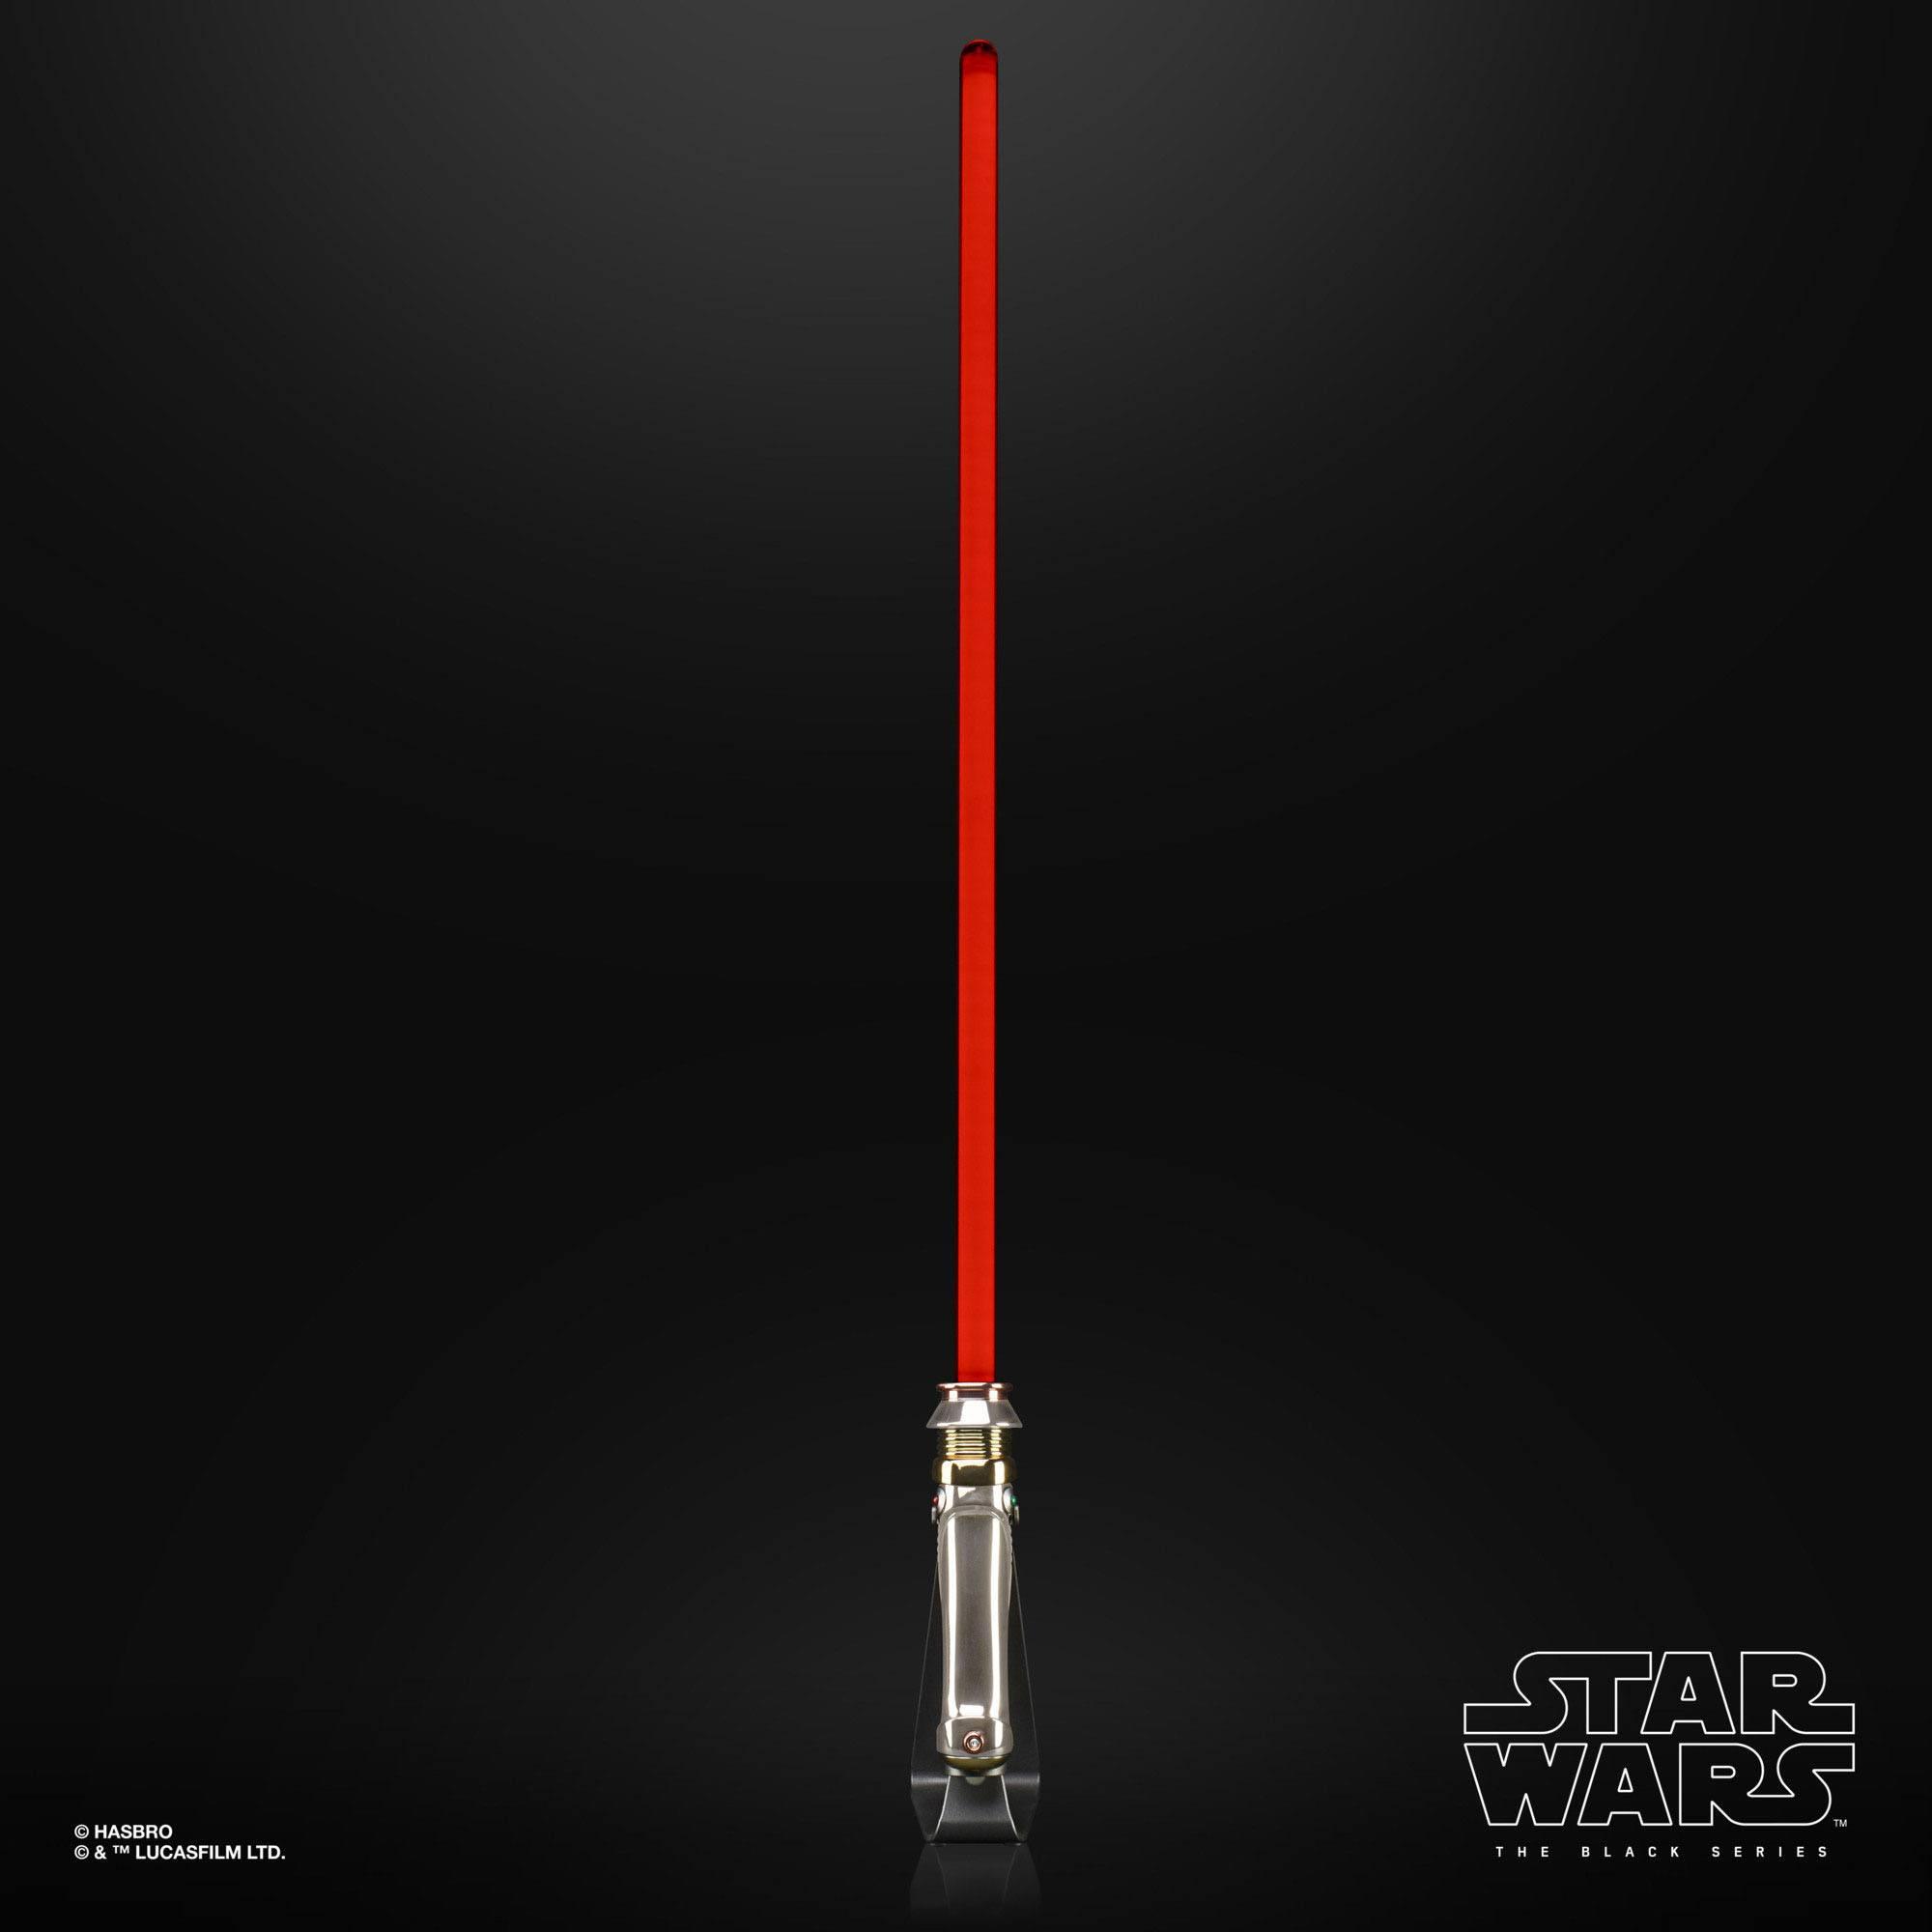 Star Wars The Black Series Emperor Palpatine Force FX Elite Lightsaber E94985L0 5010993756643